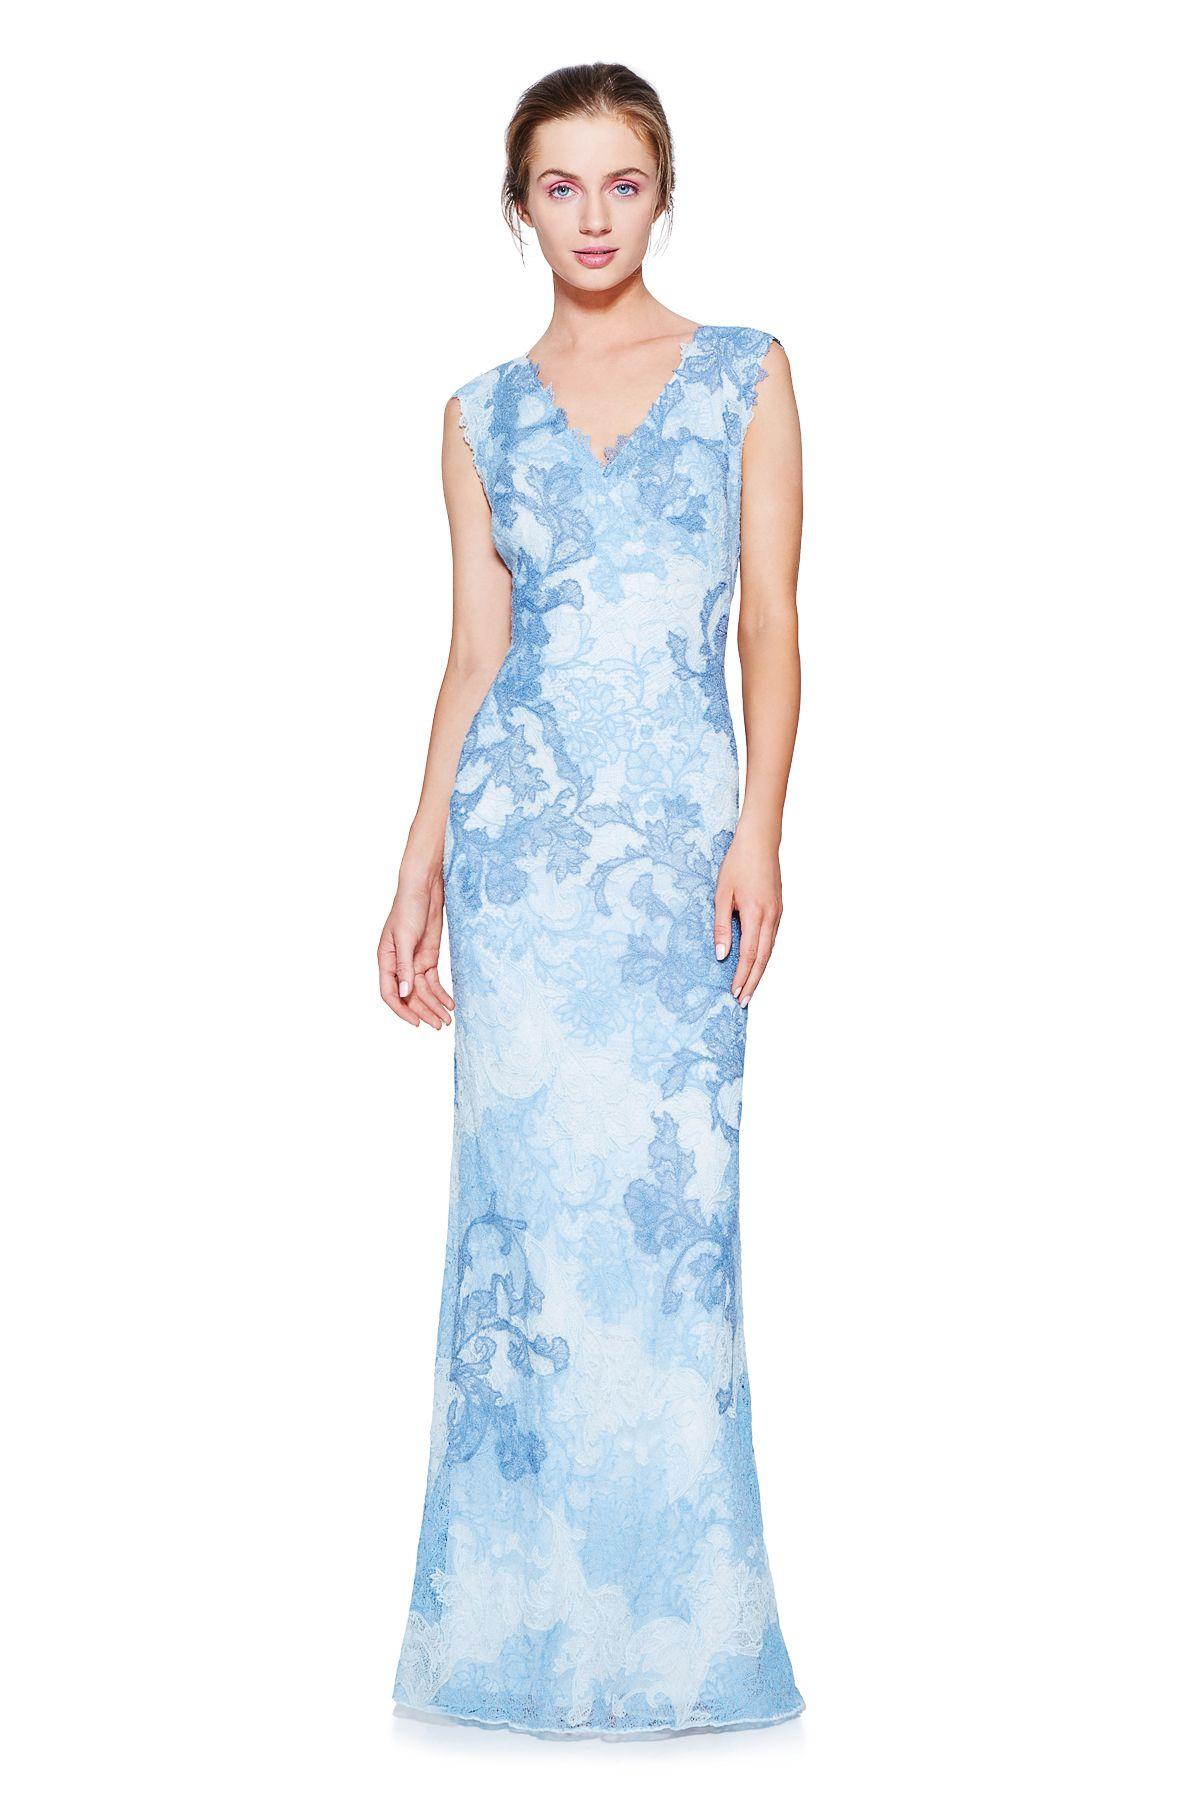 Emma Gown l Tadashi Shoji | Watercolor Motifs | Pinterest | Gowns ...